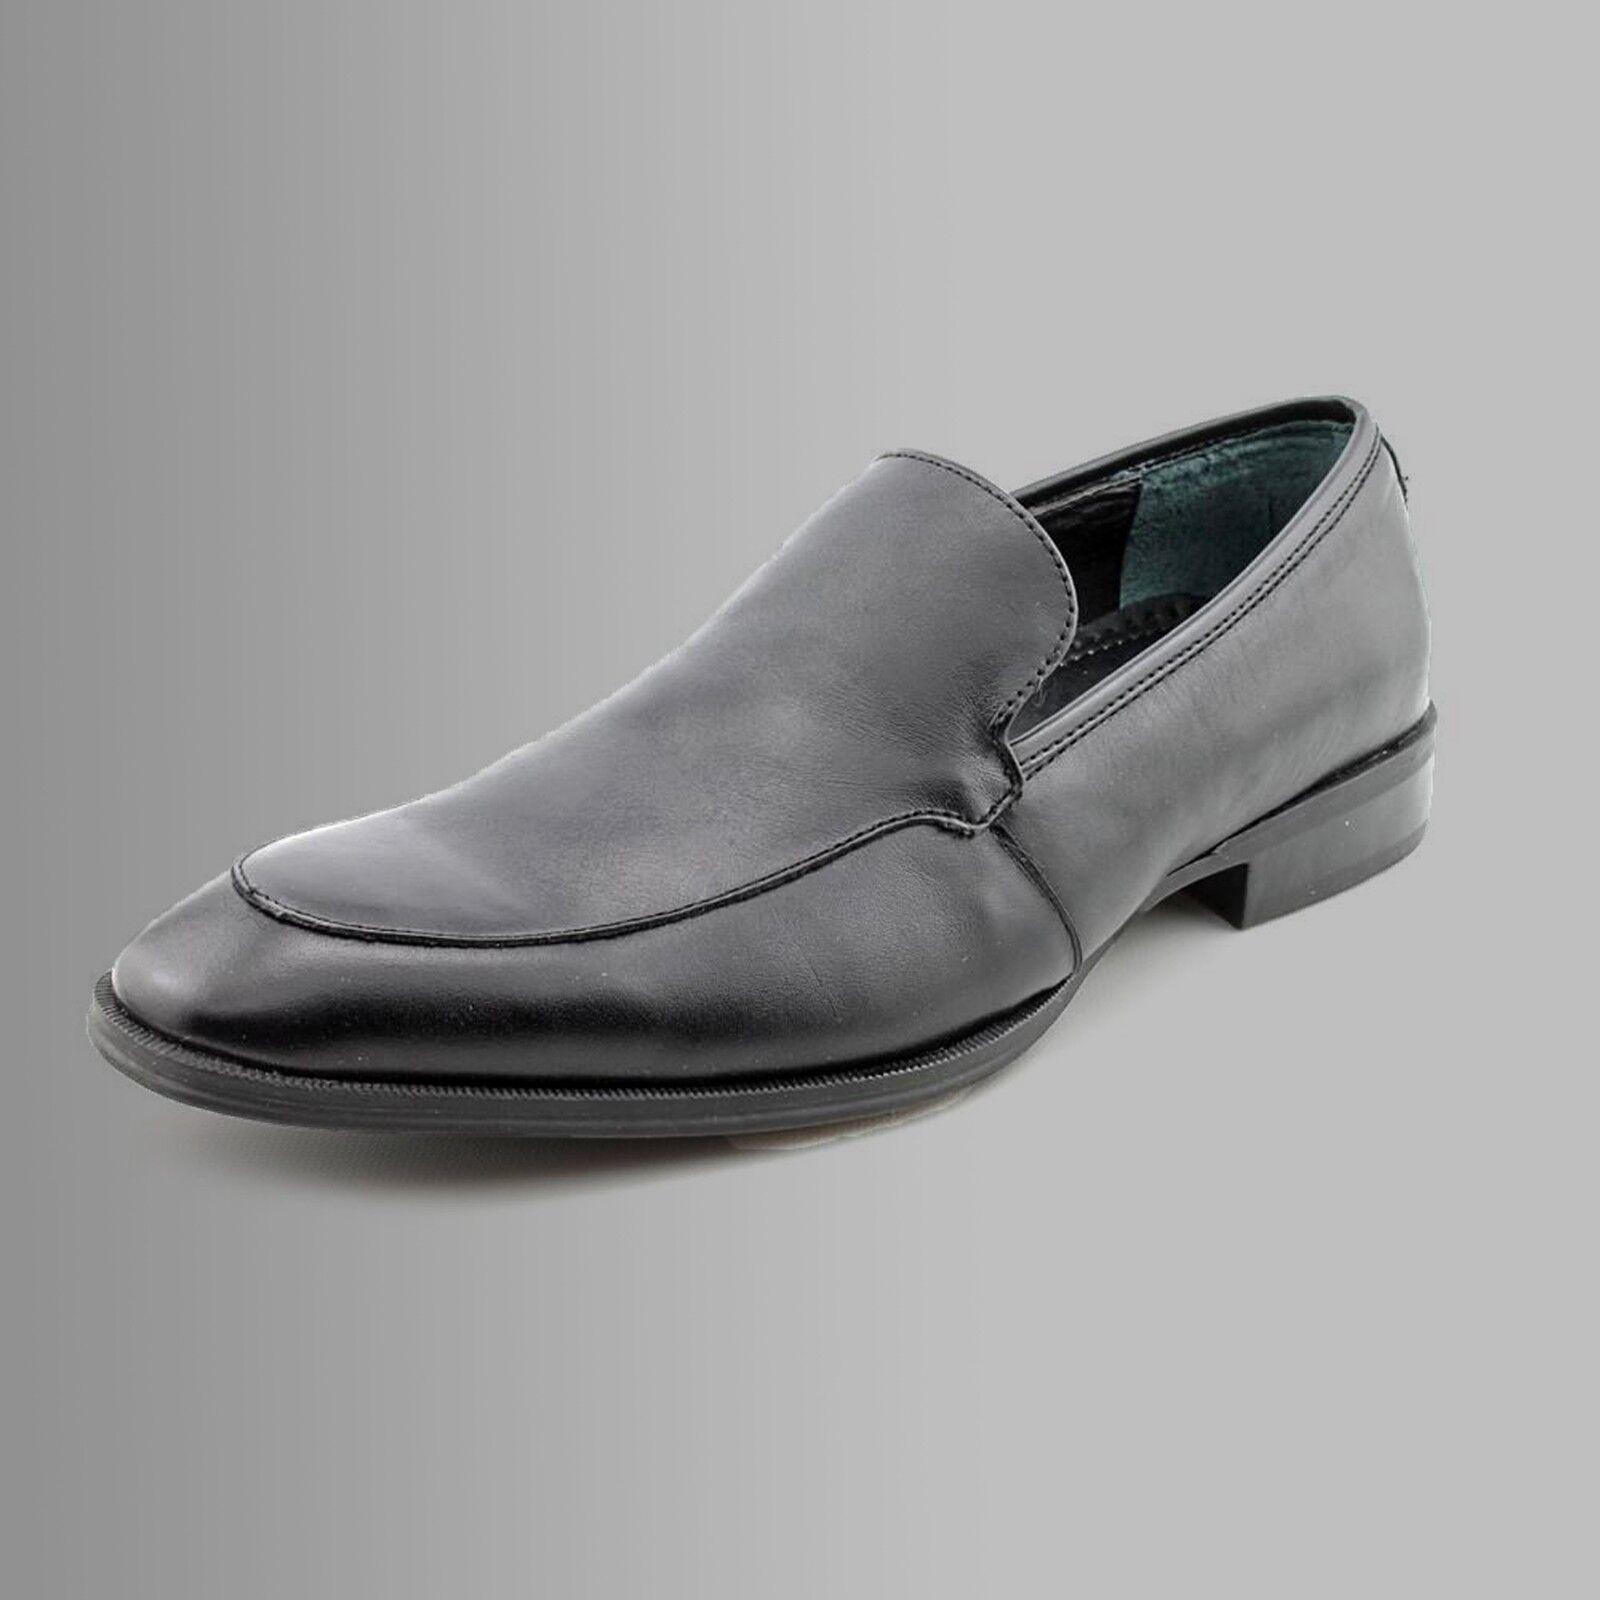 NEU ALFANI Herren Leder Schwarz Abend Business Schuhe EUR 39,5 USA Gemach